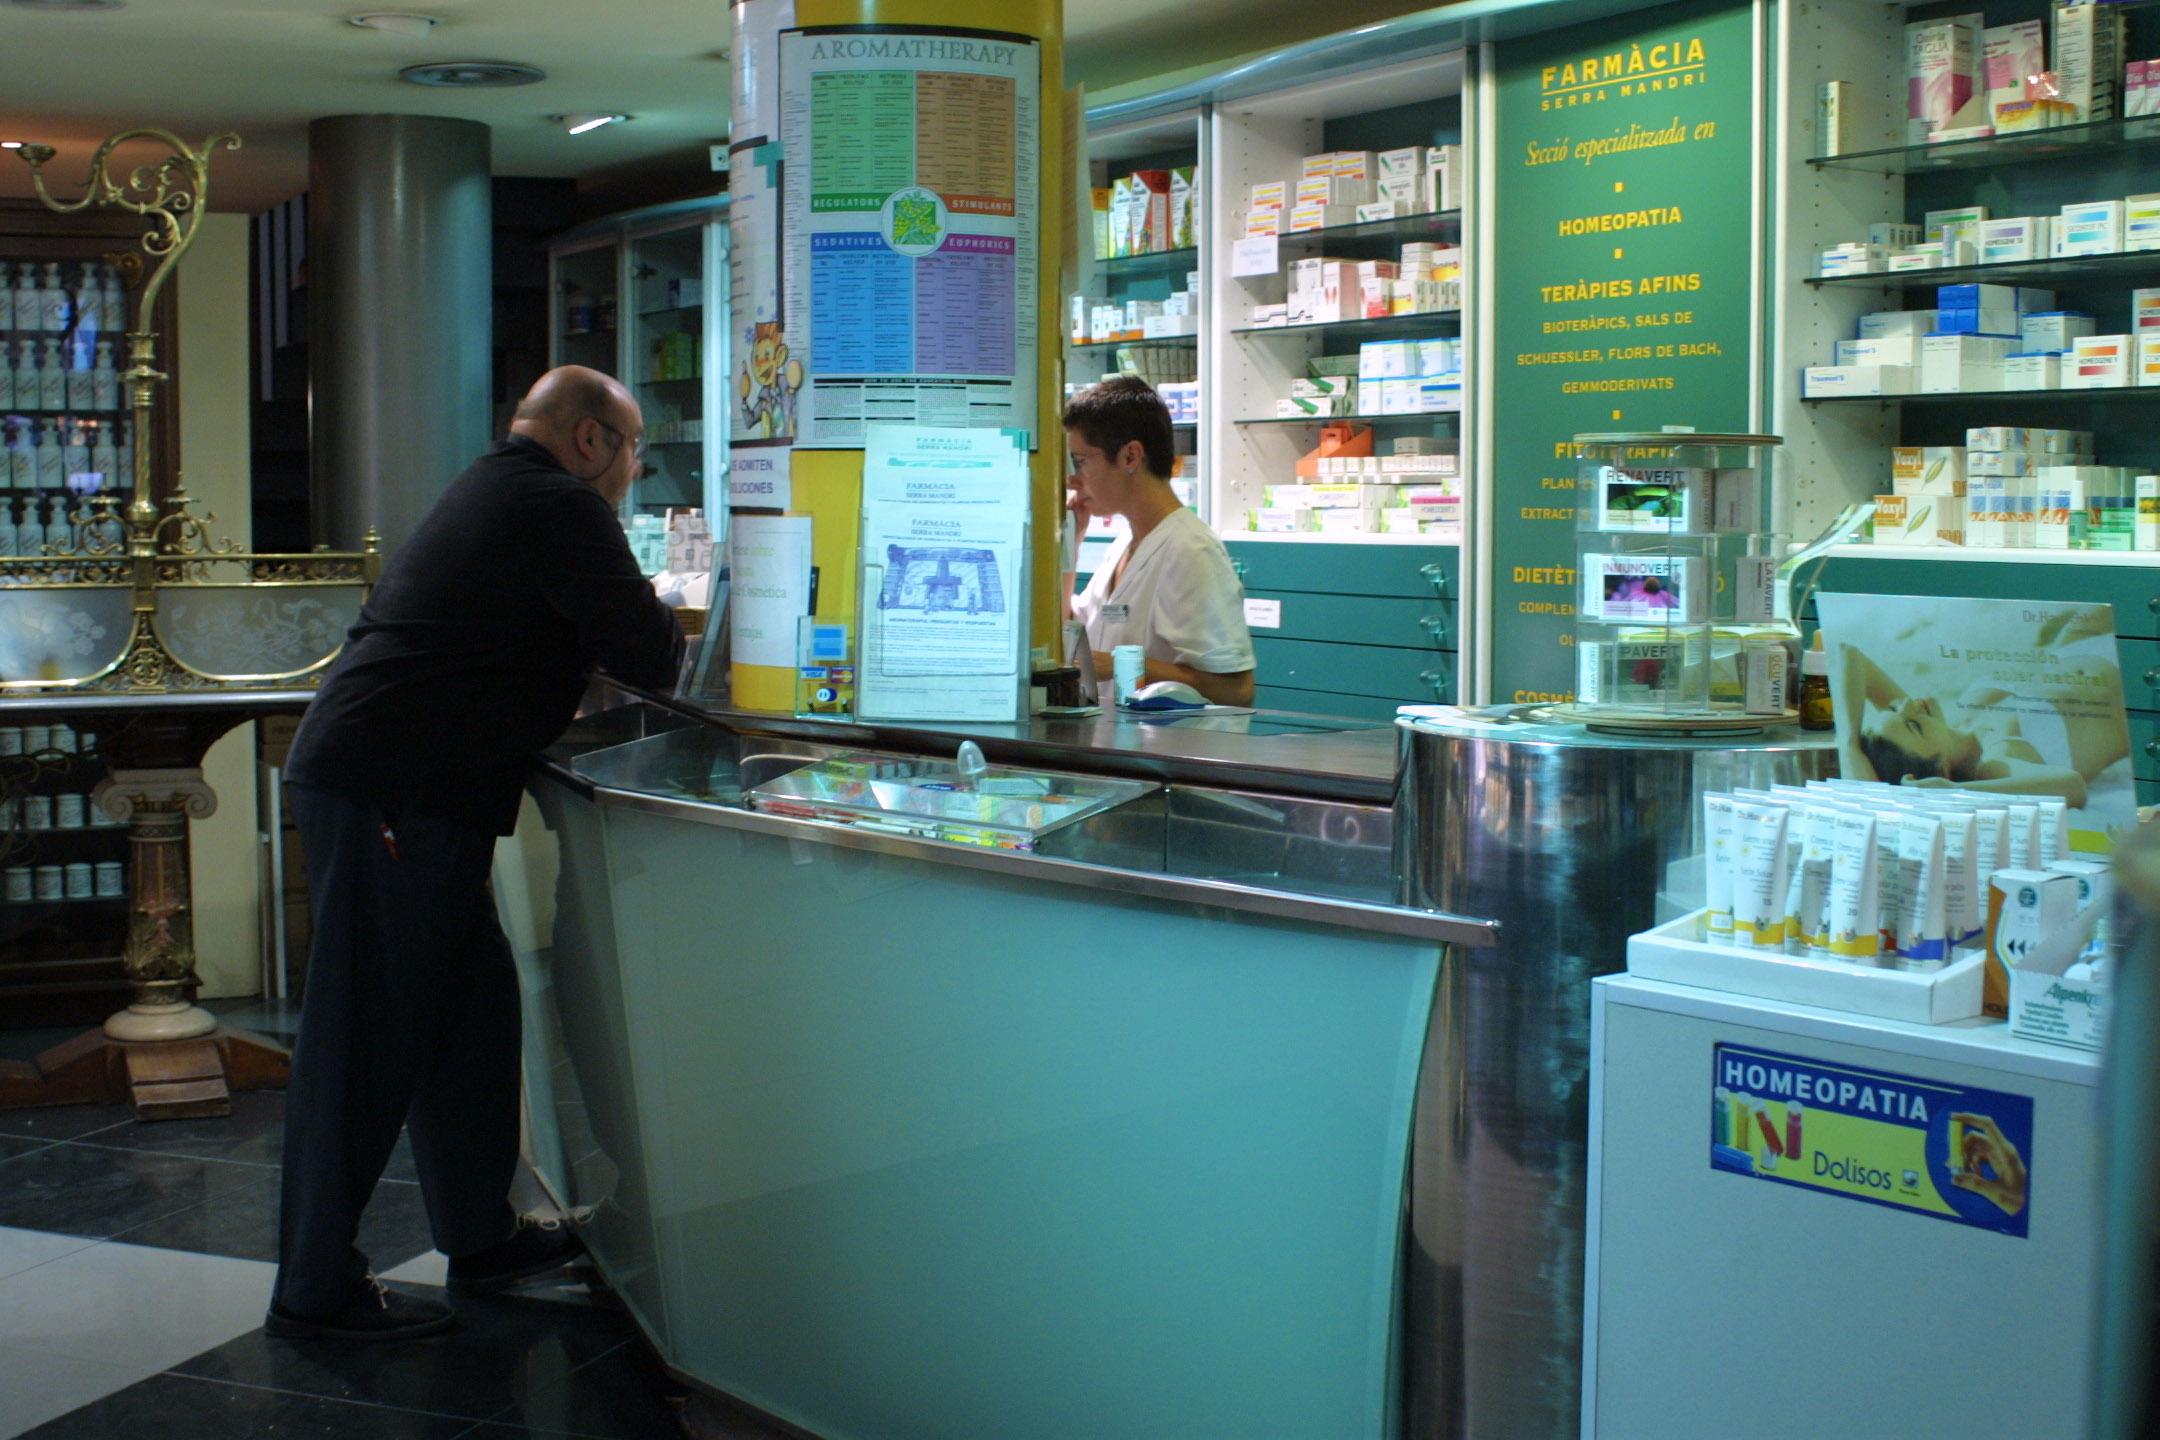 homeopatia-farmacia-serra